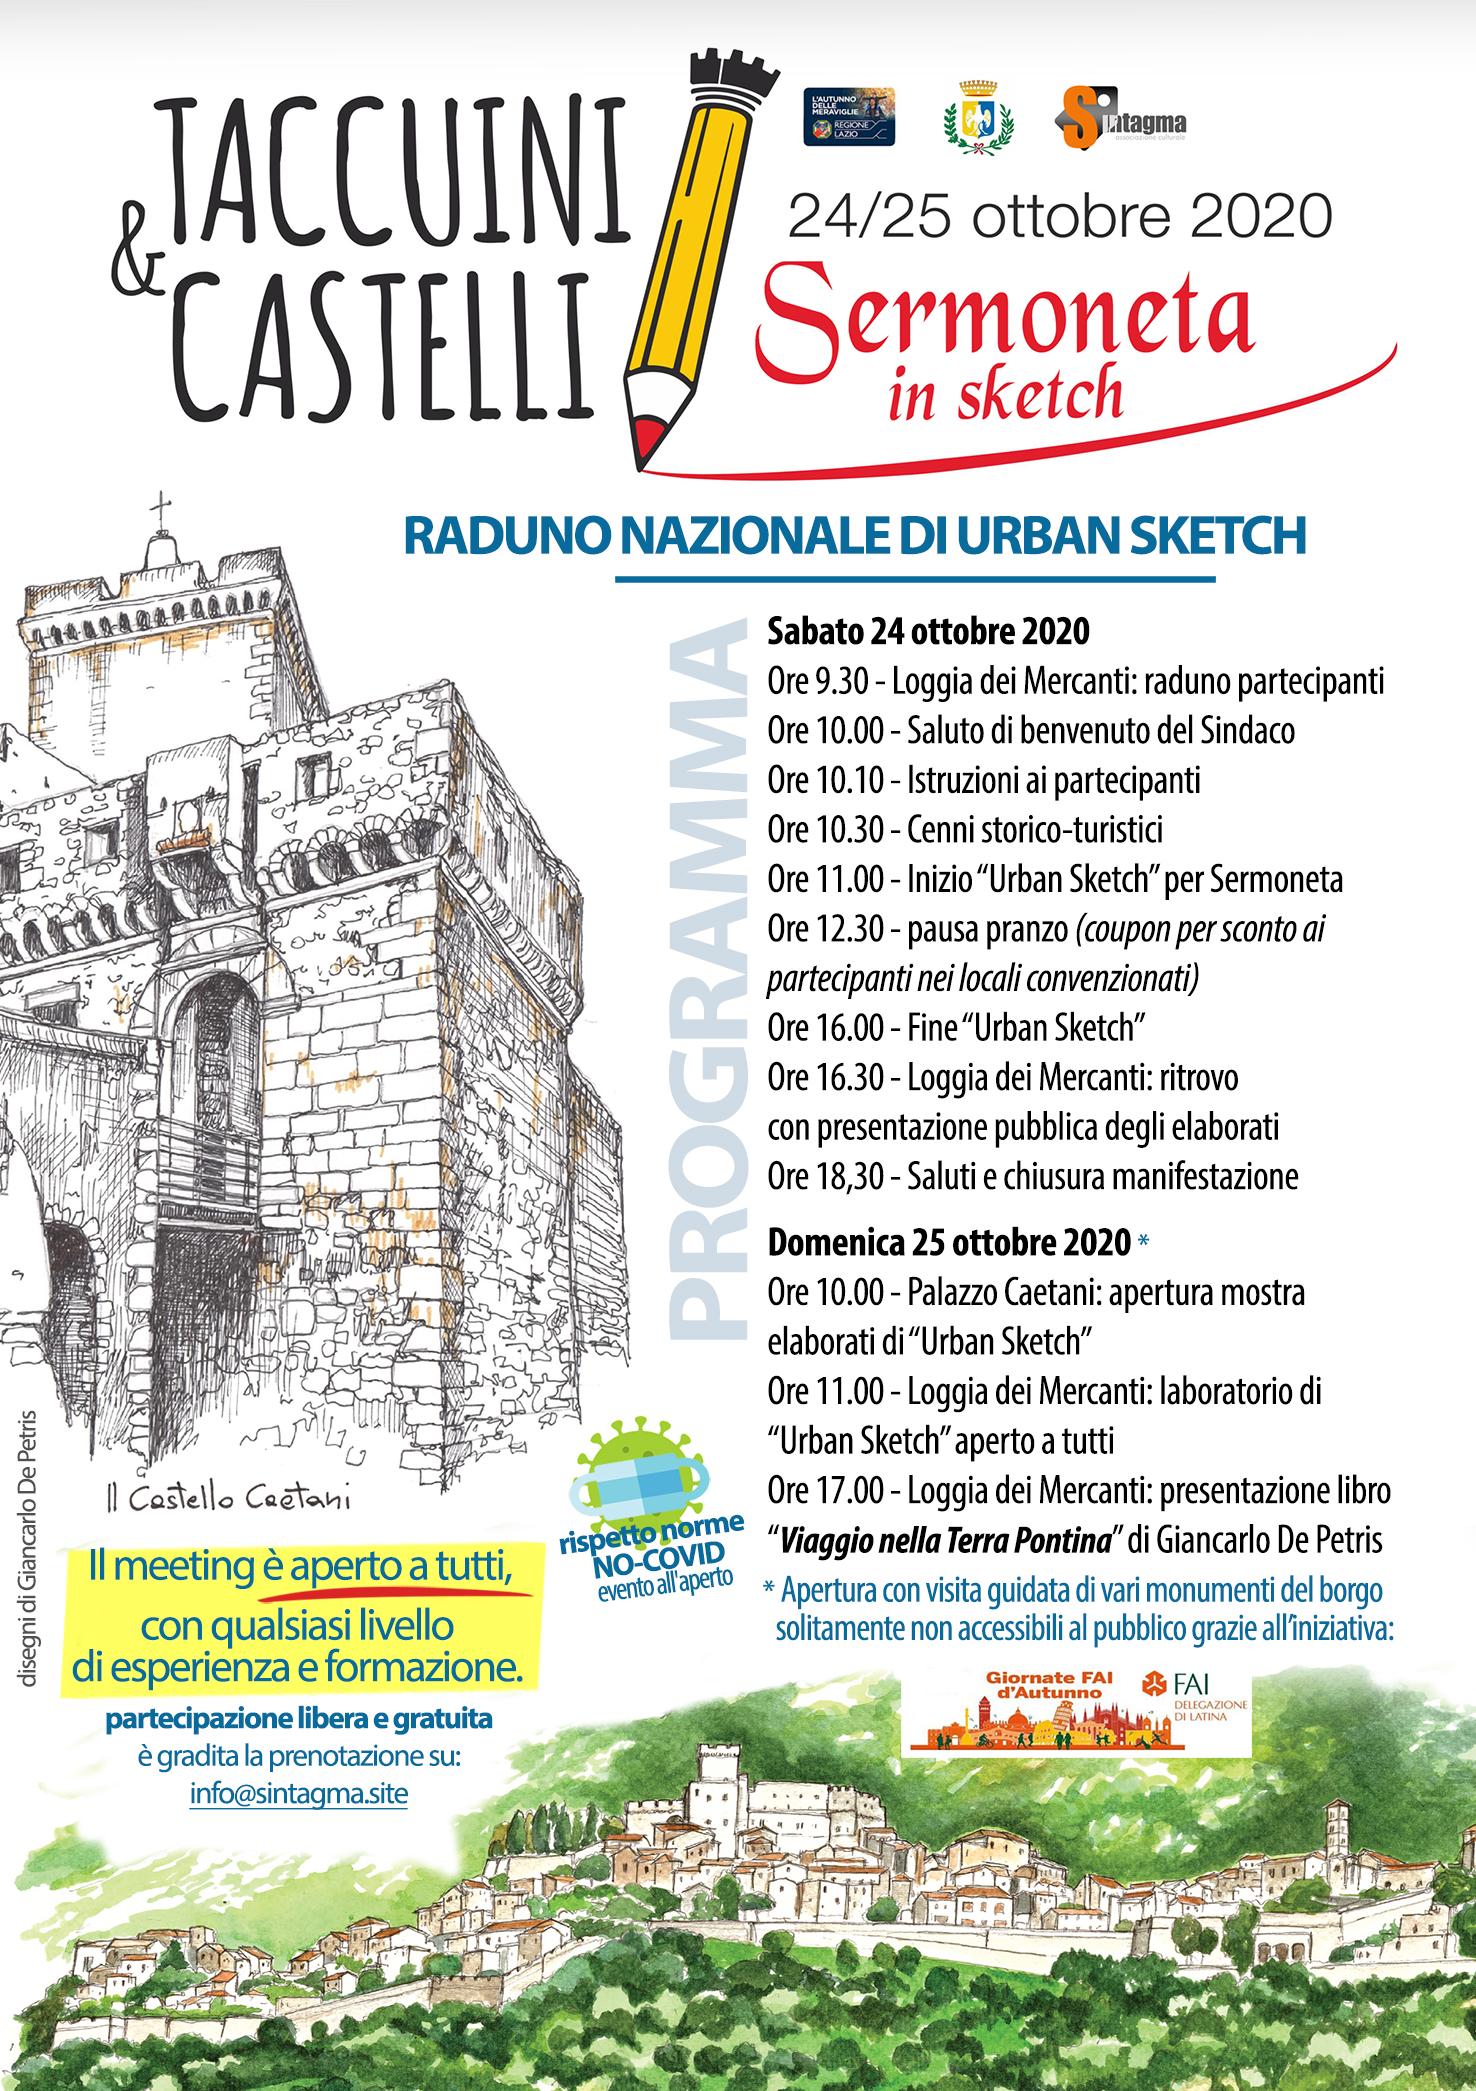 Taccuini & Castelli